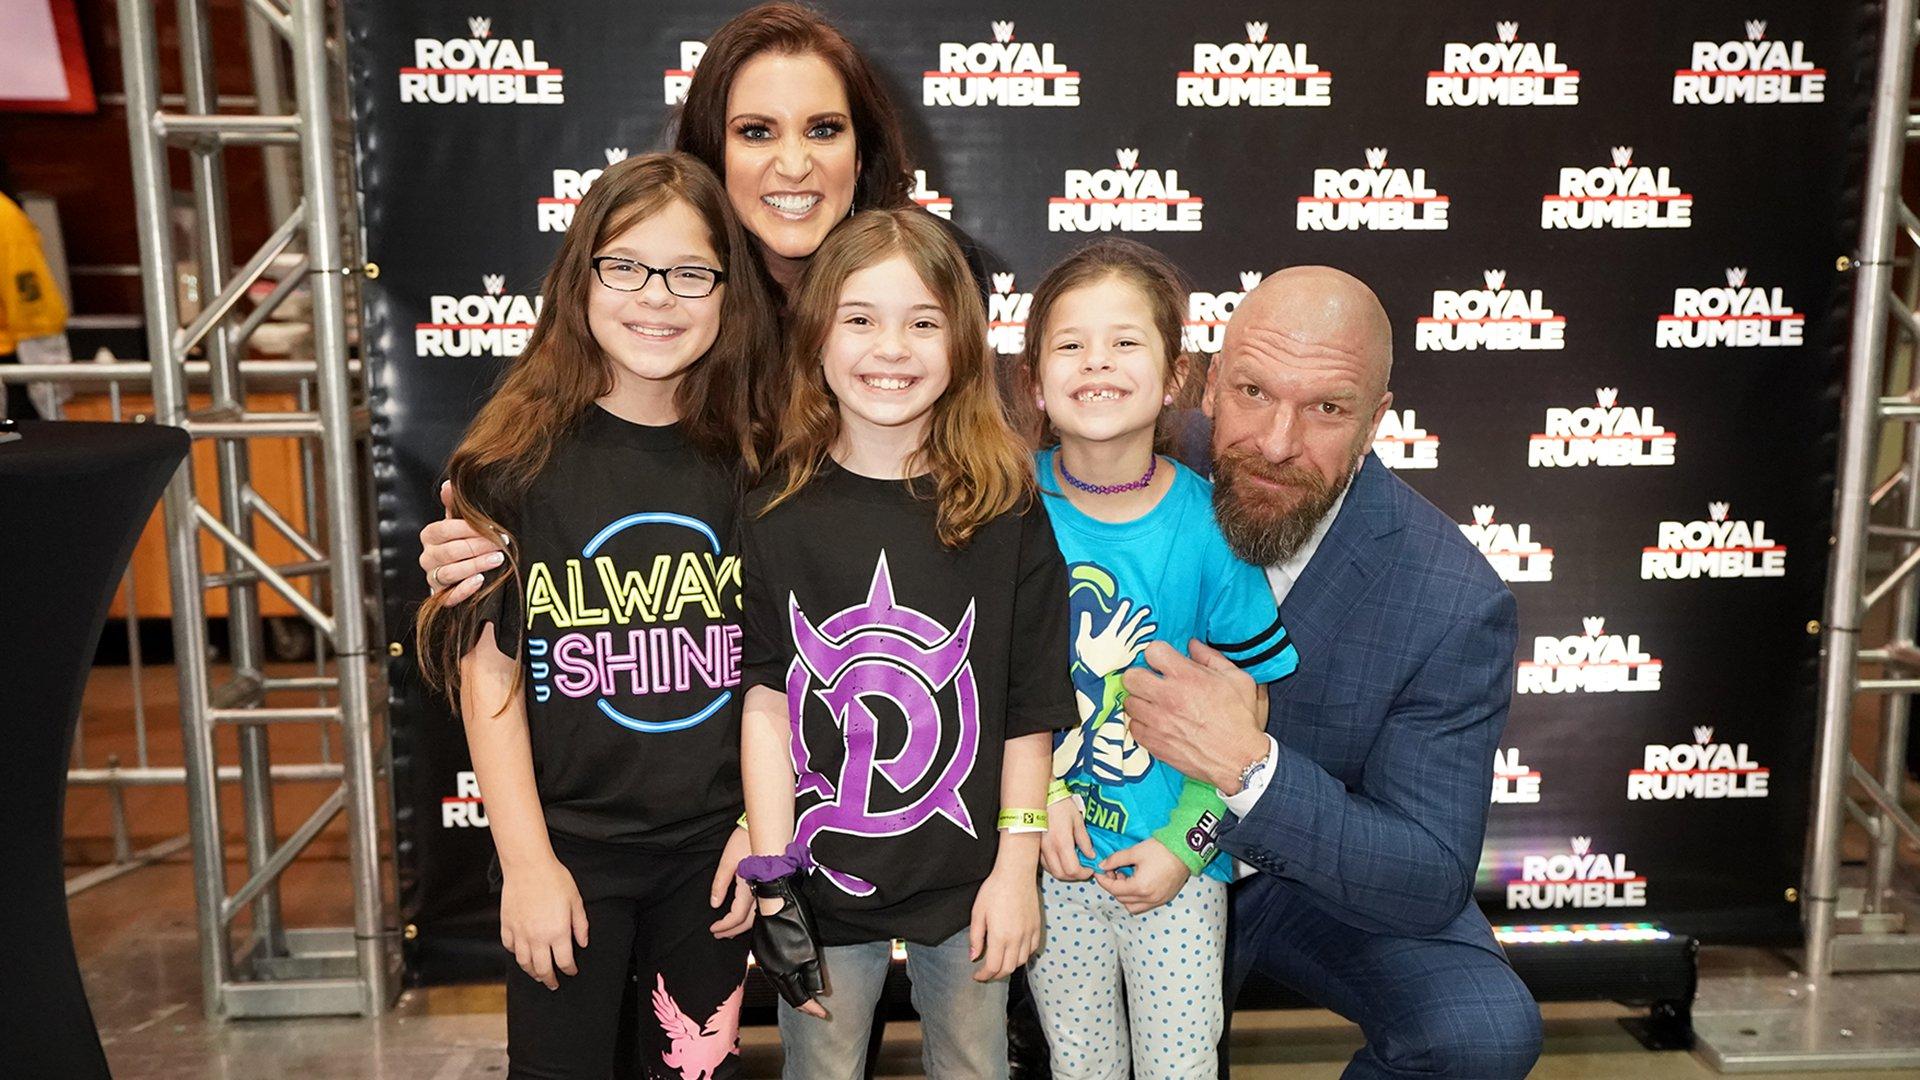 Triple H & Stephanie McMahon greet the WWE Universe at Royal Rumble Axxess: photos